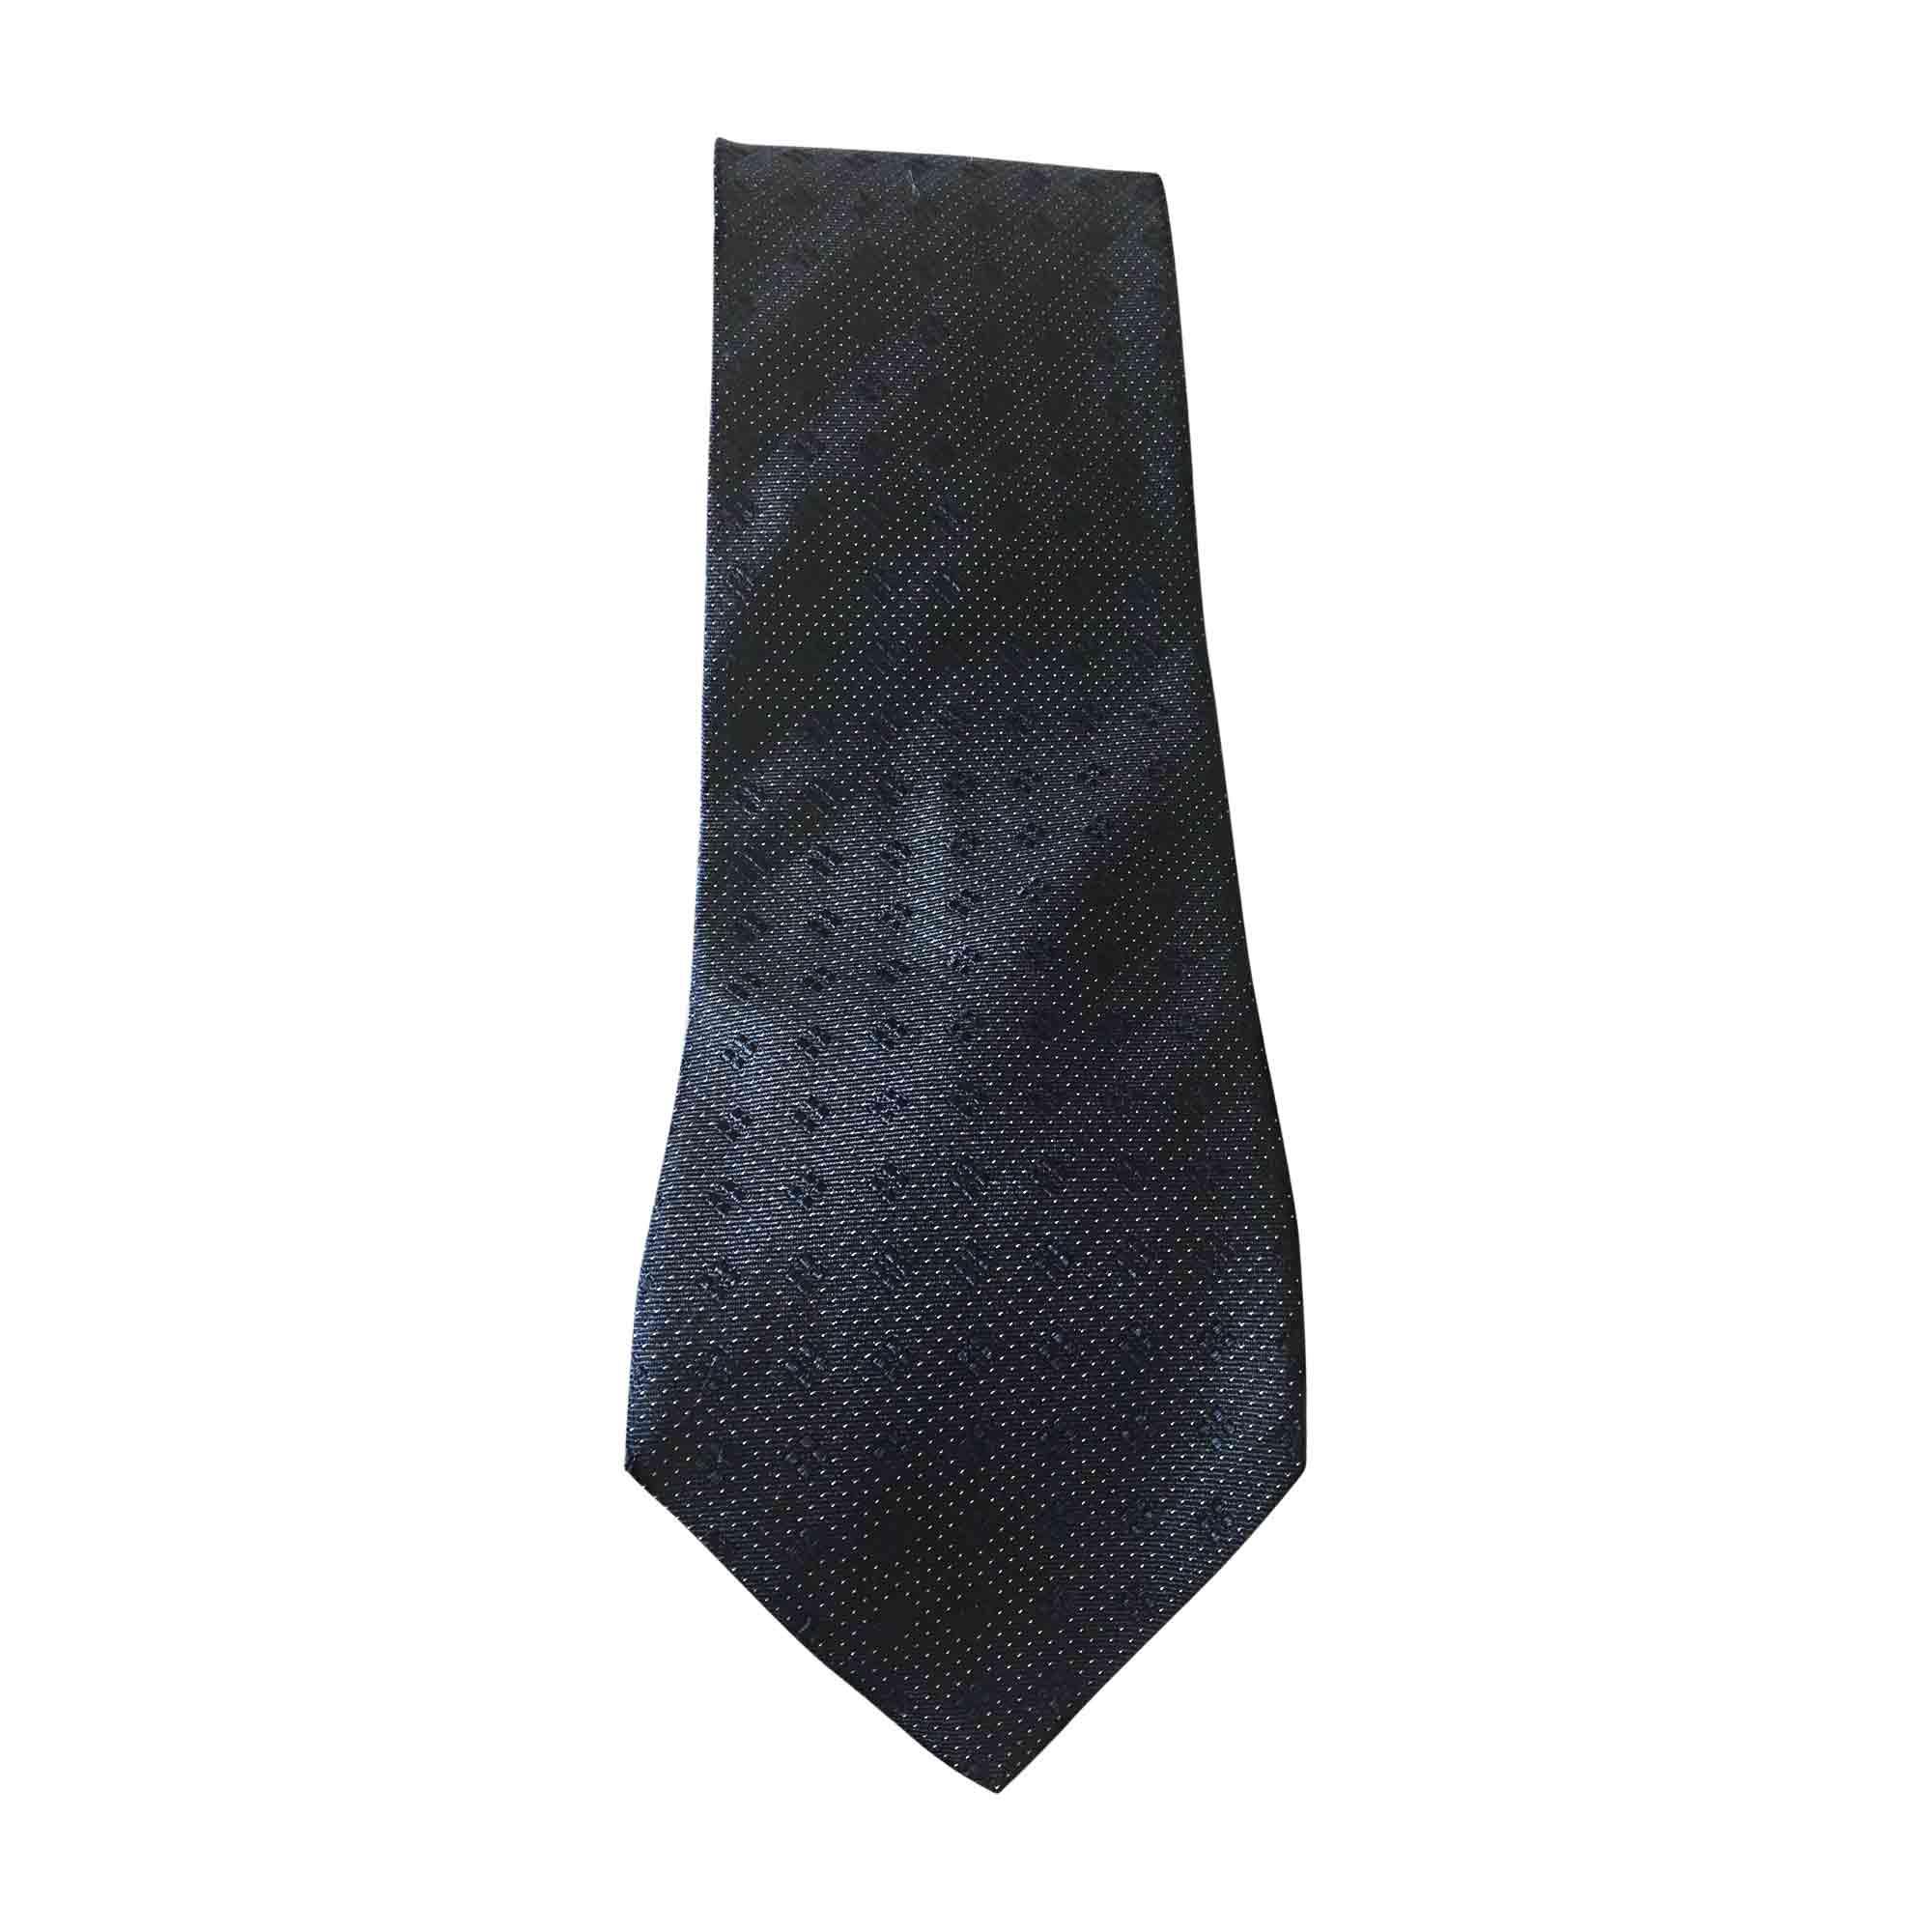 Tie ARMANI Blue, navy, turquoise